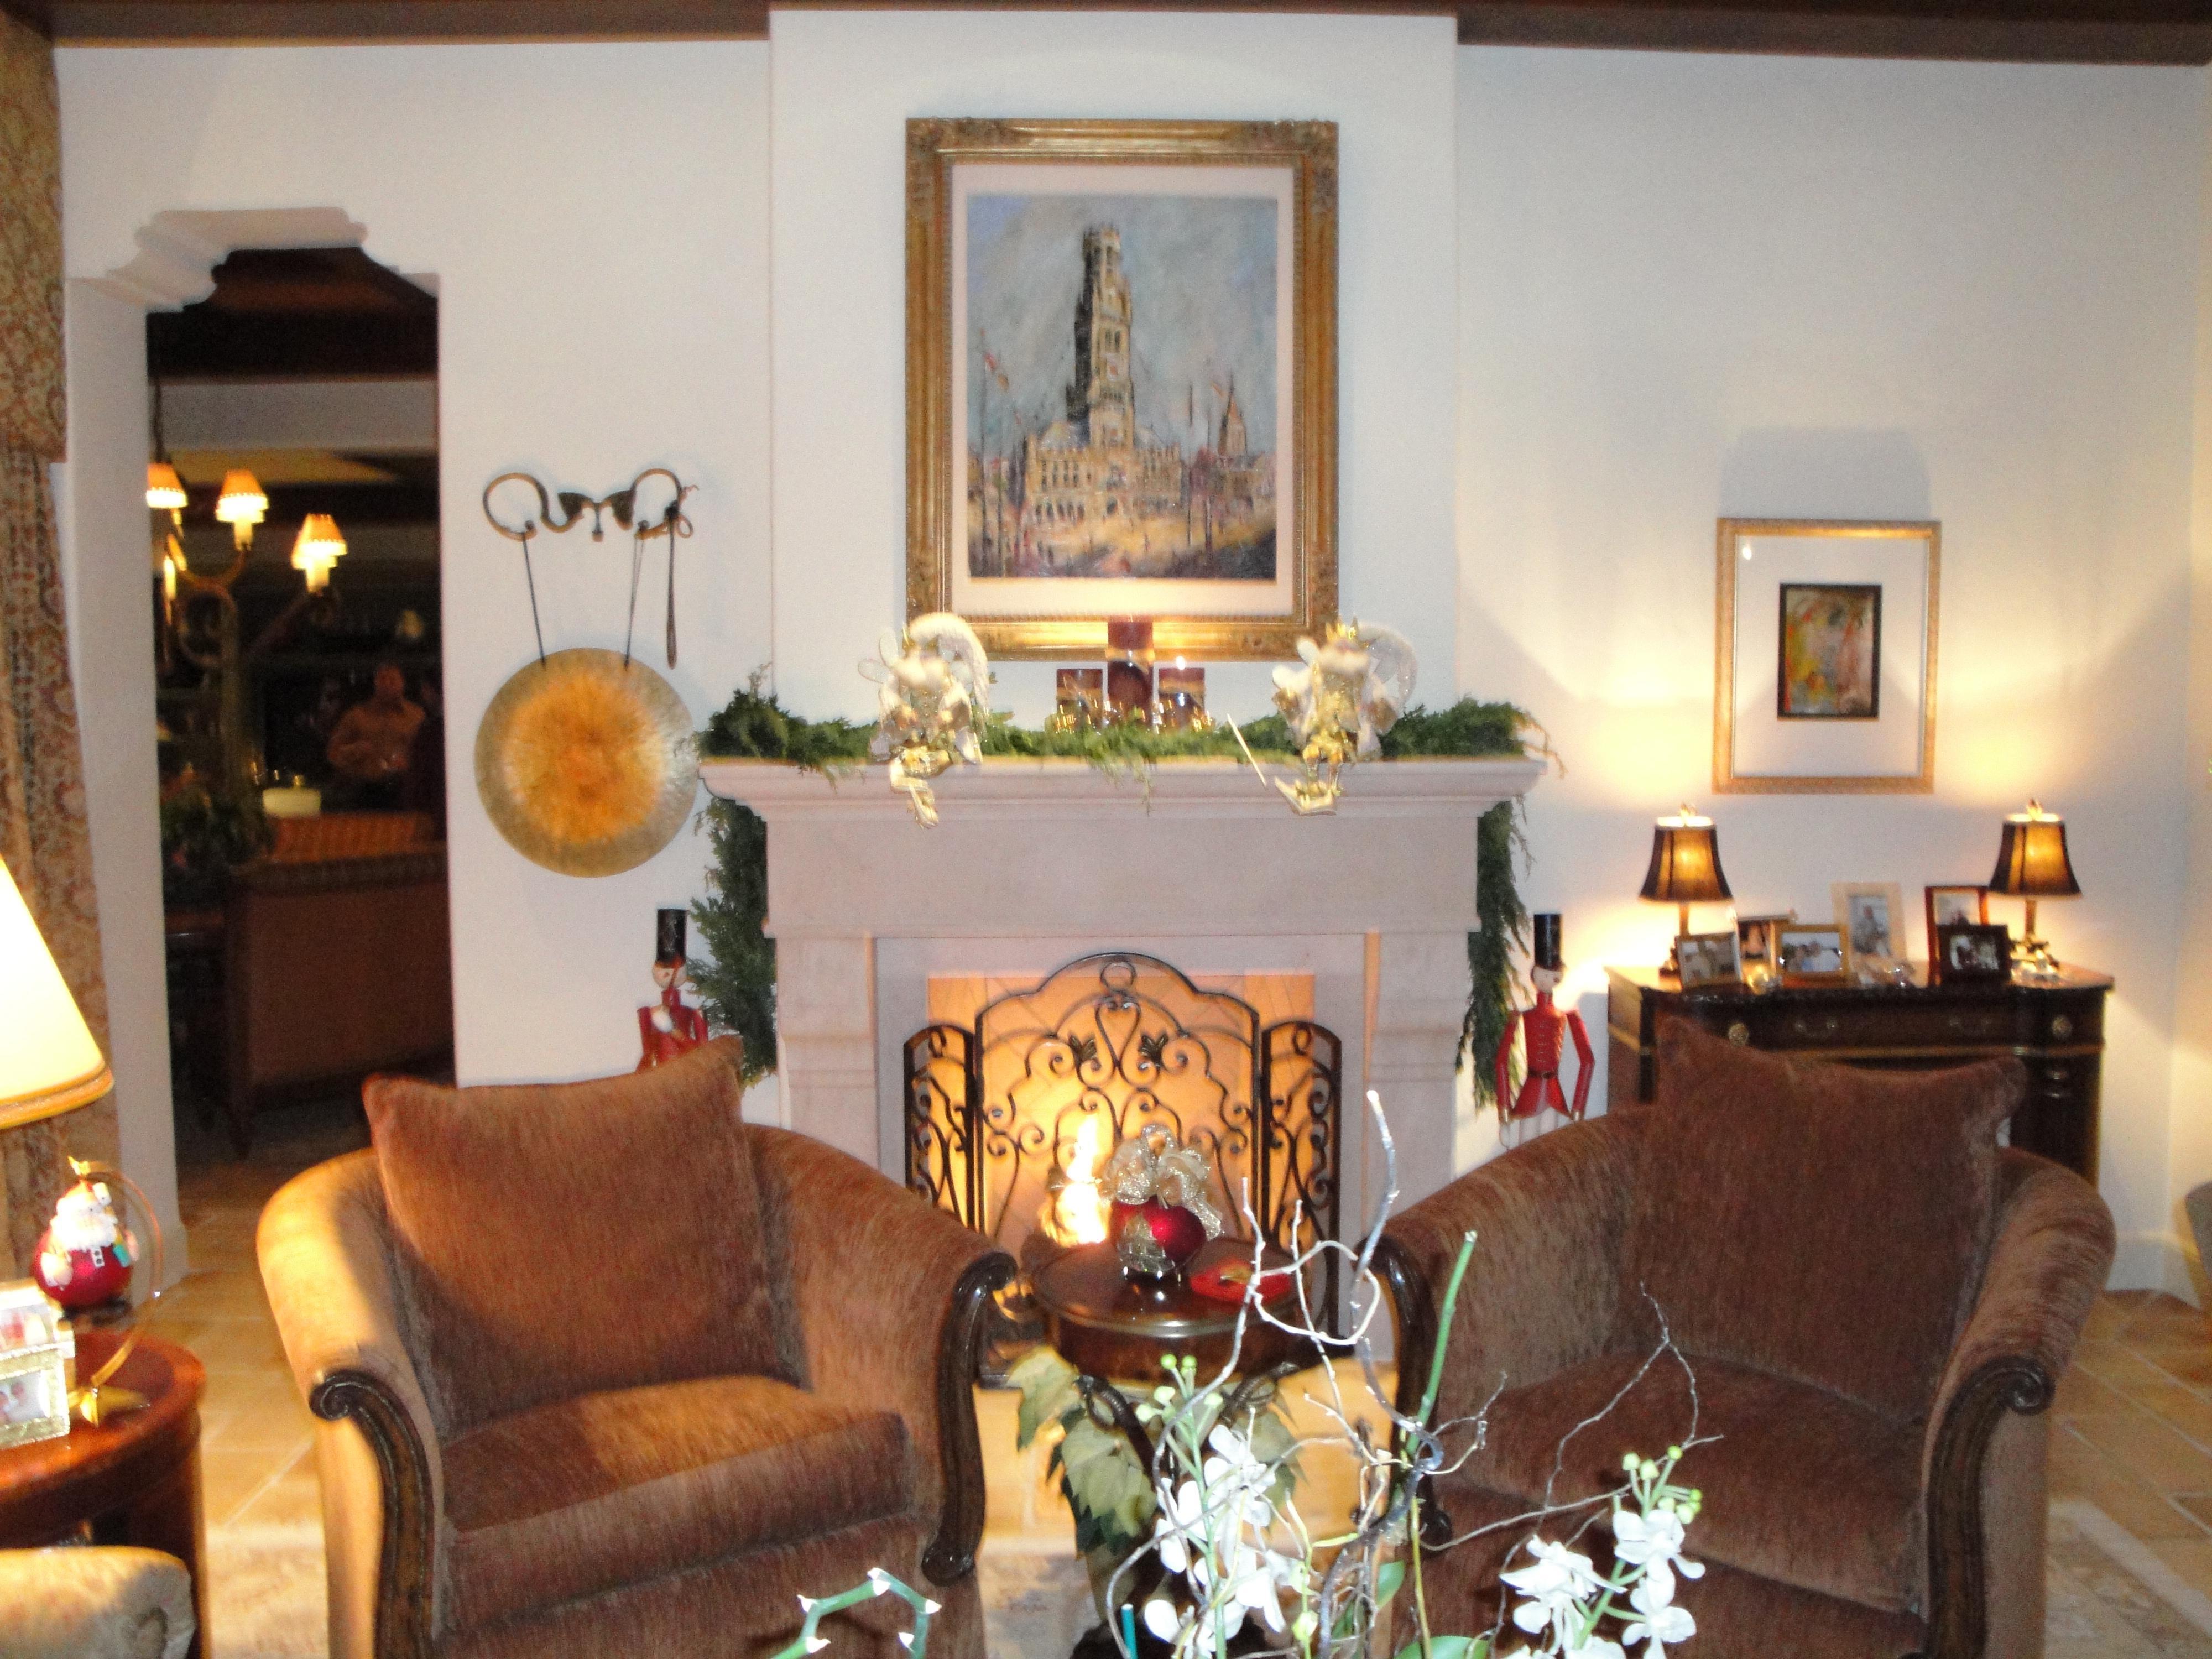 Robelen Hanah Homes LLC image 8